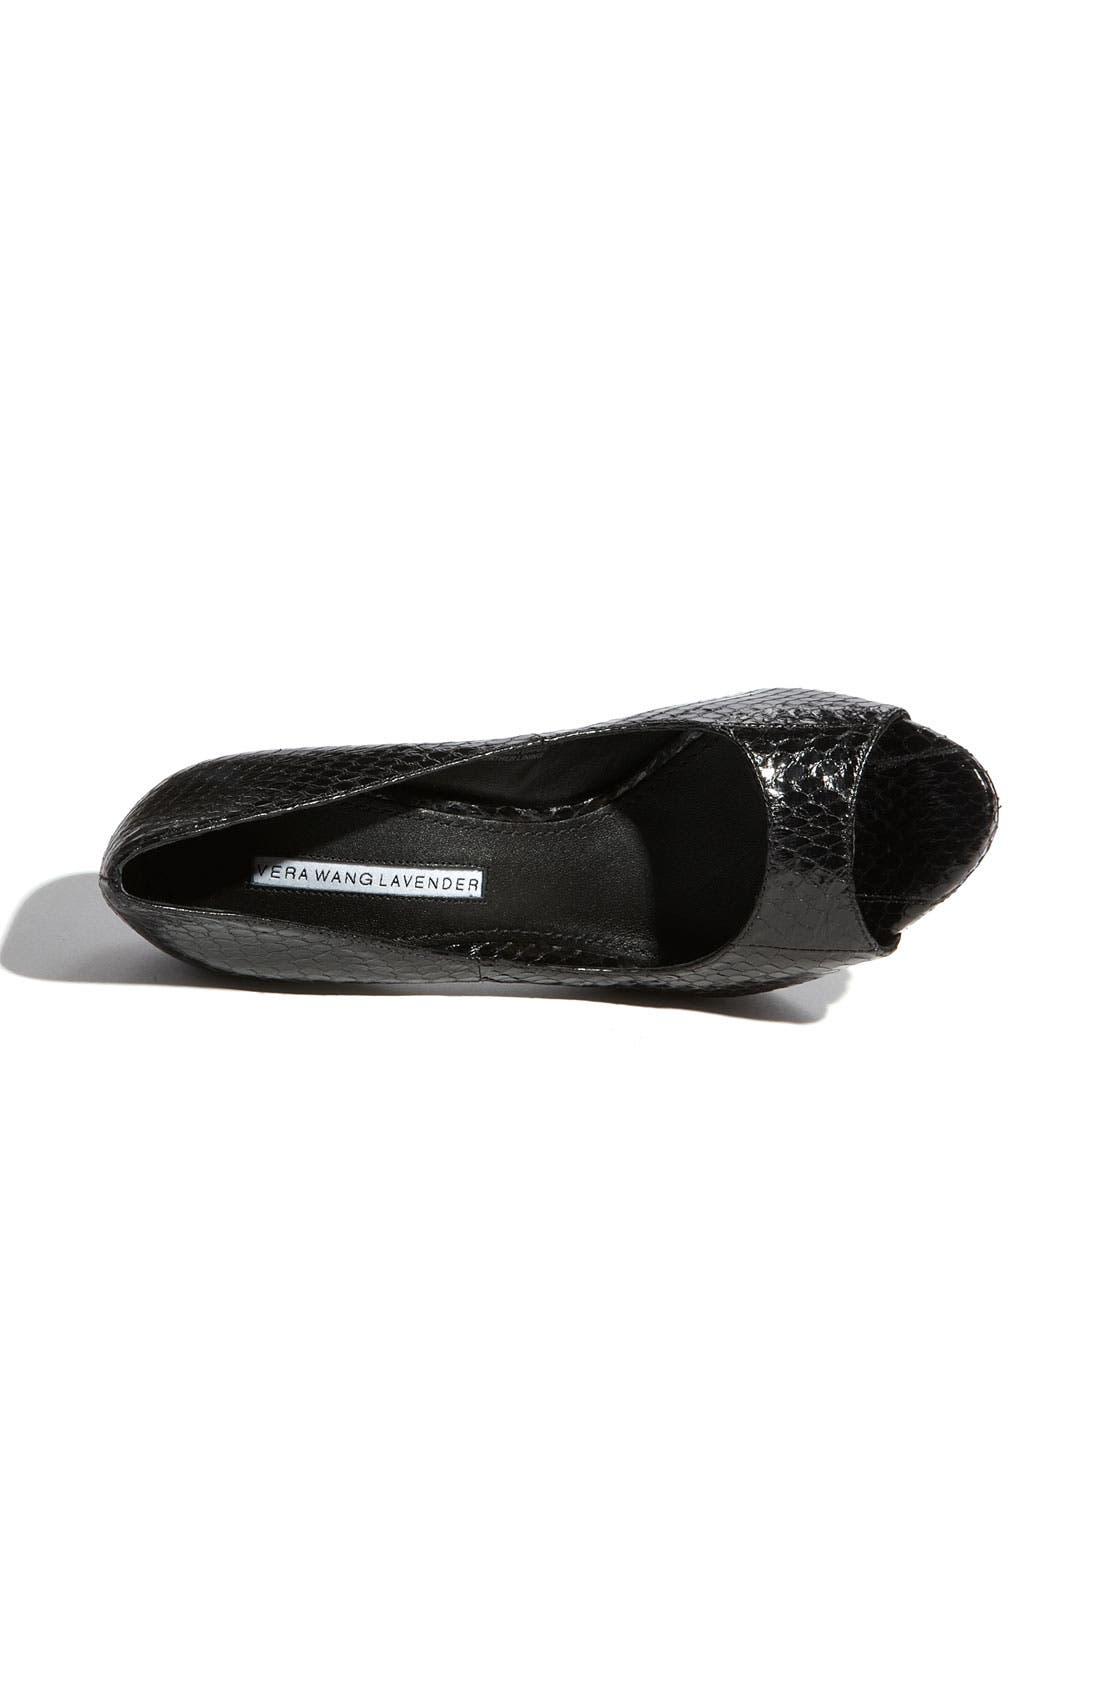 Footwear 'Selima' Peep Toe Pump,                             Alternate thumbnail 13, color,